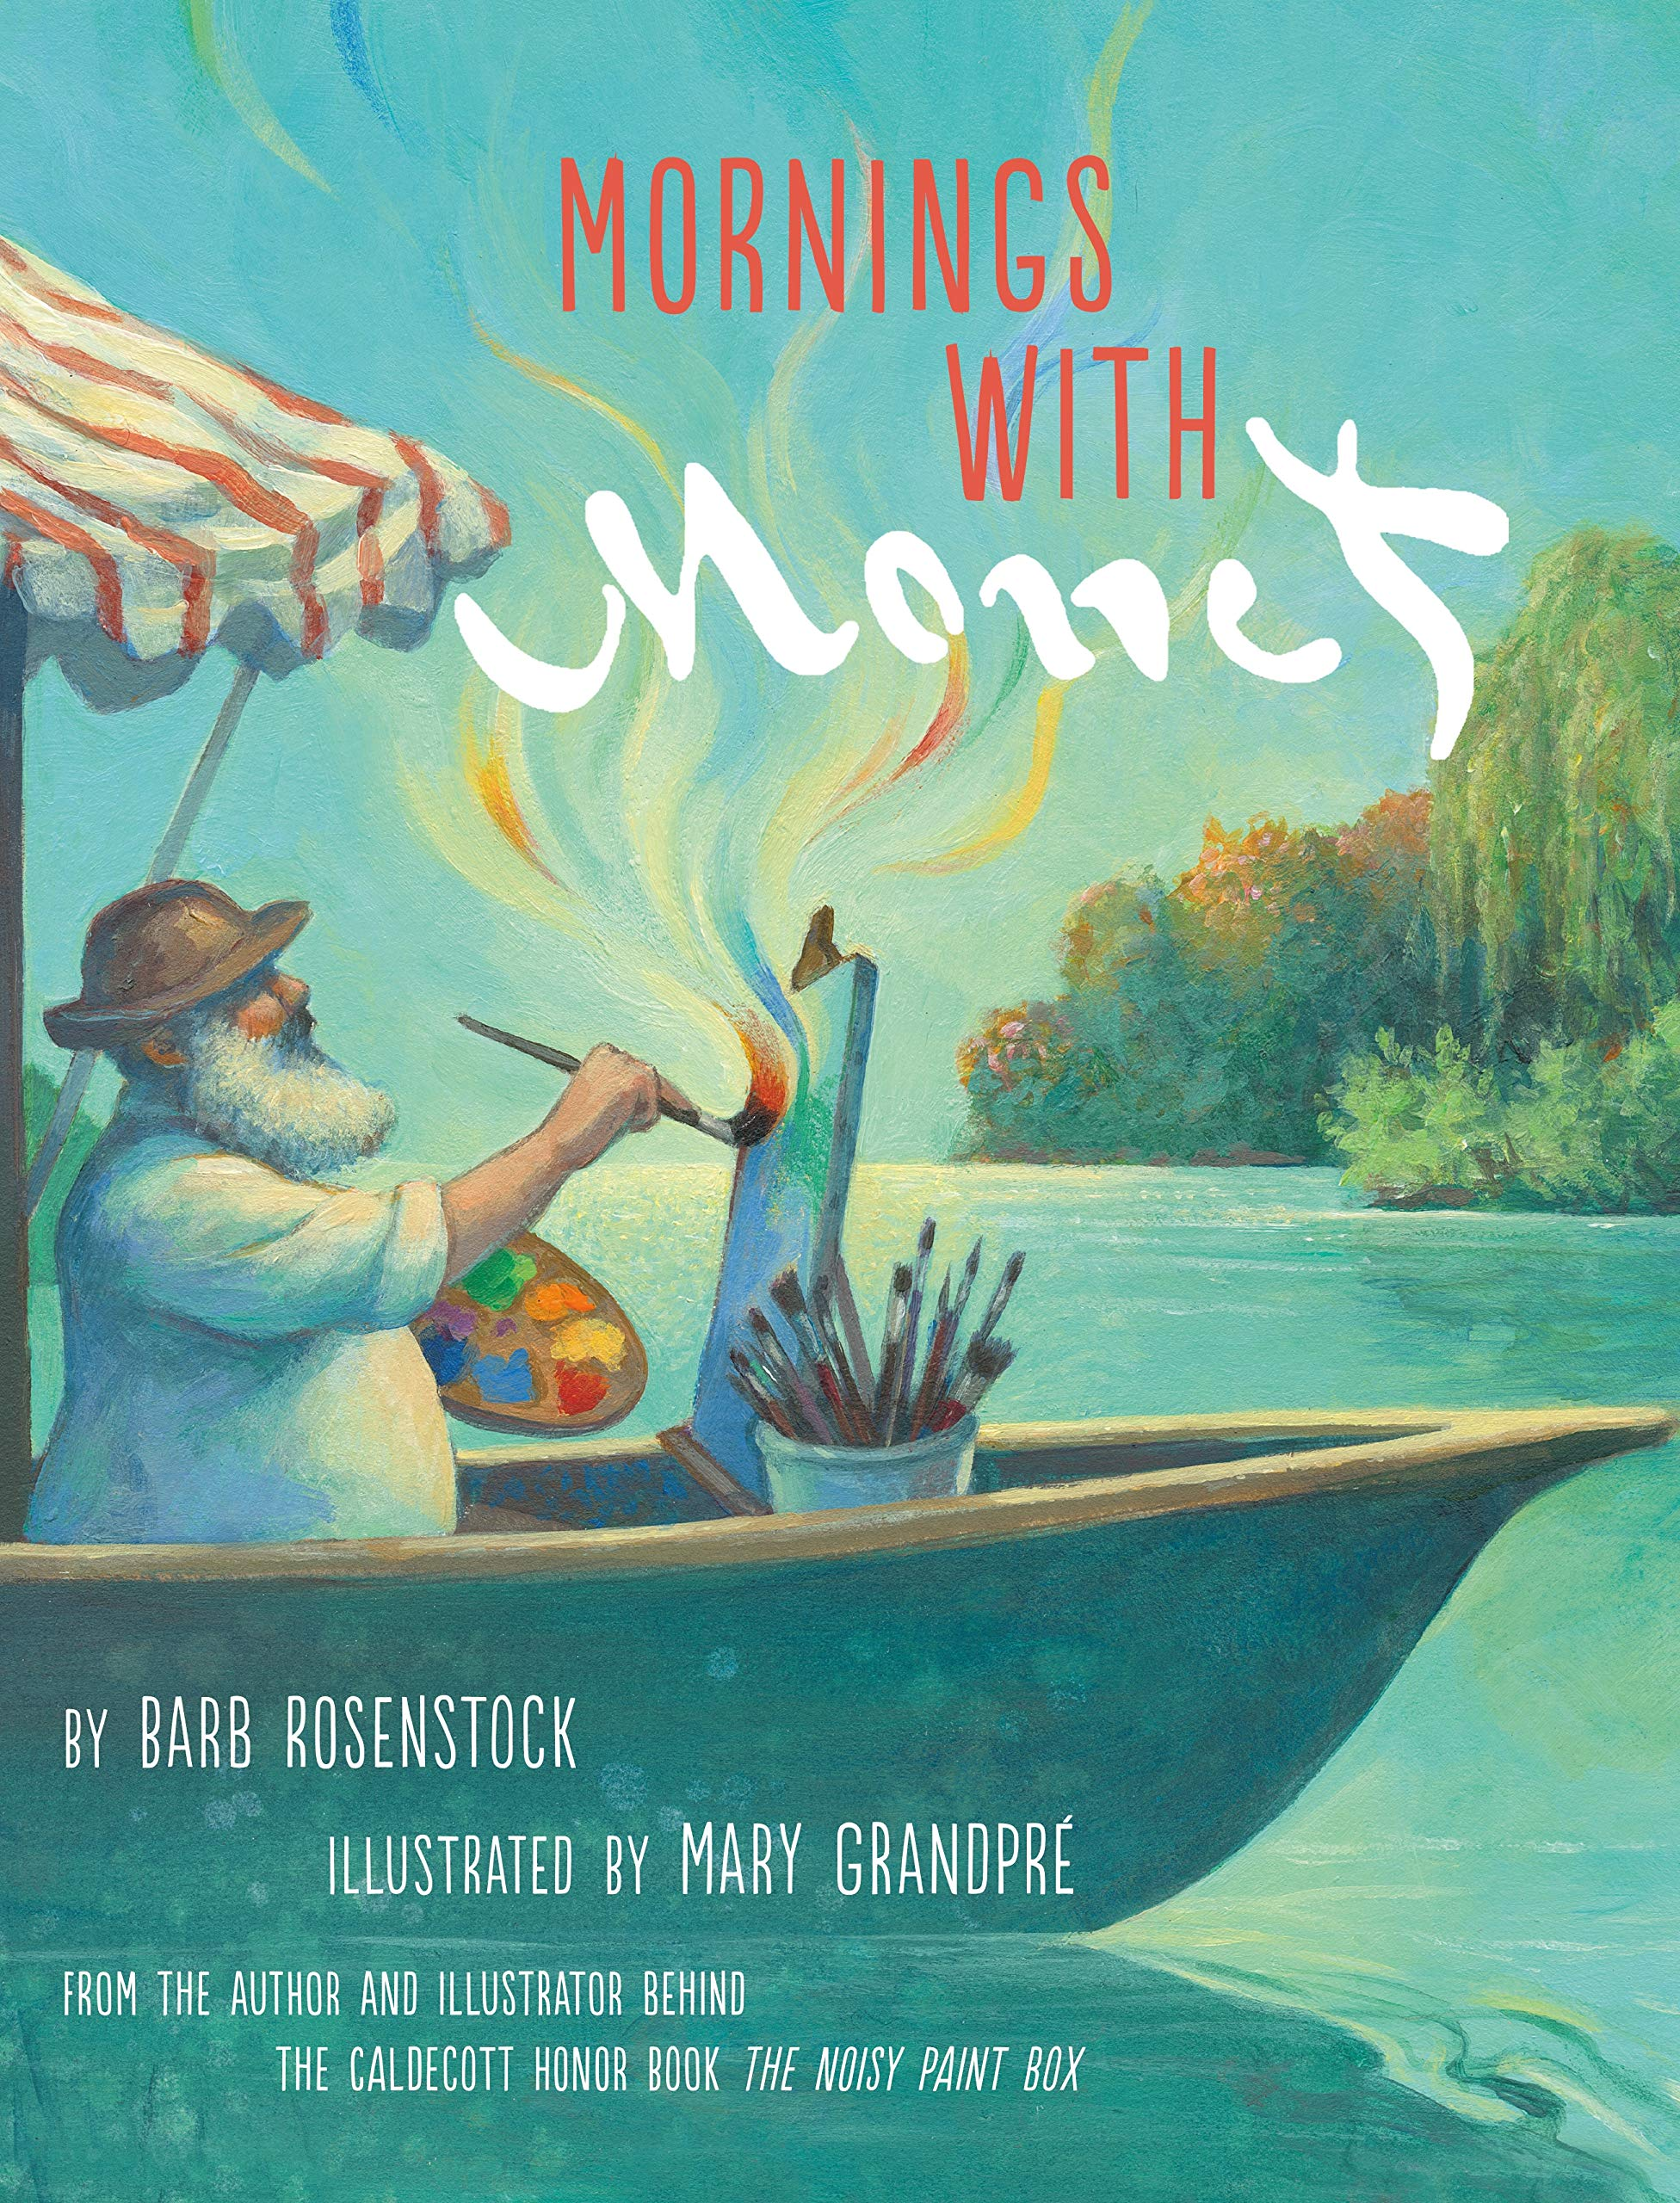 Mornings with Monet: Rosenstock, Barb, GrandPre, Mary: 9780525708179:  Amazon.com: Books